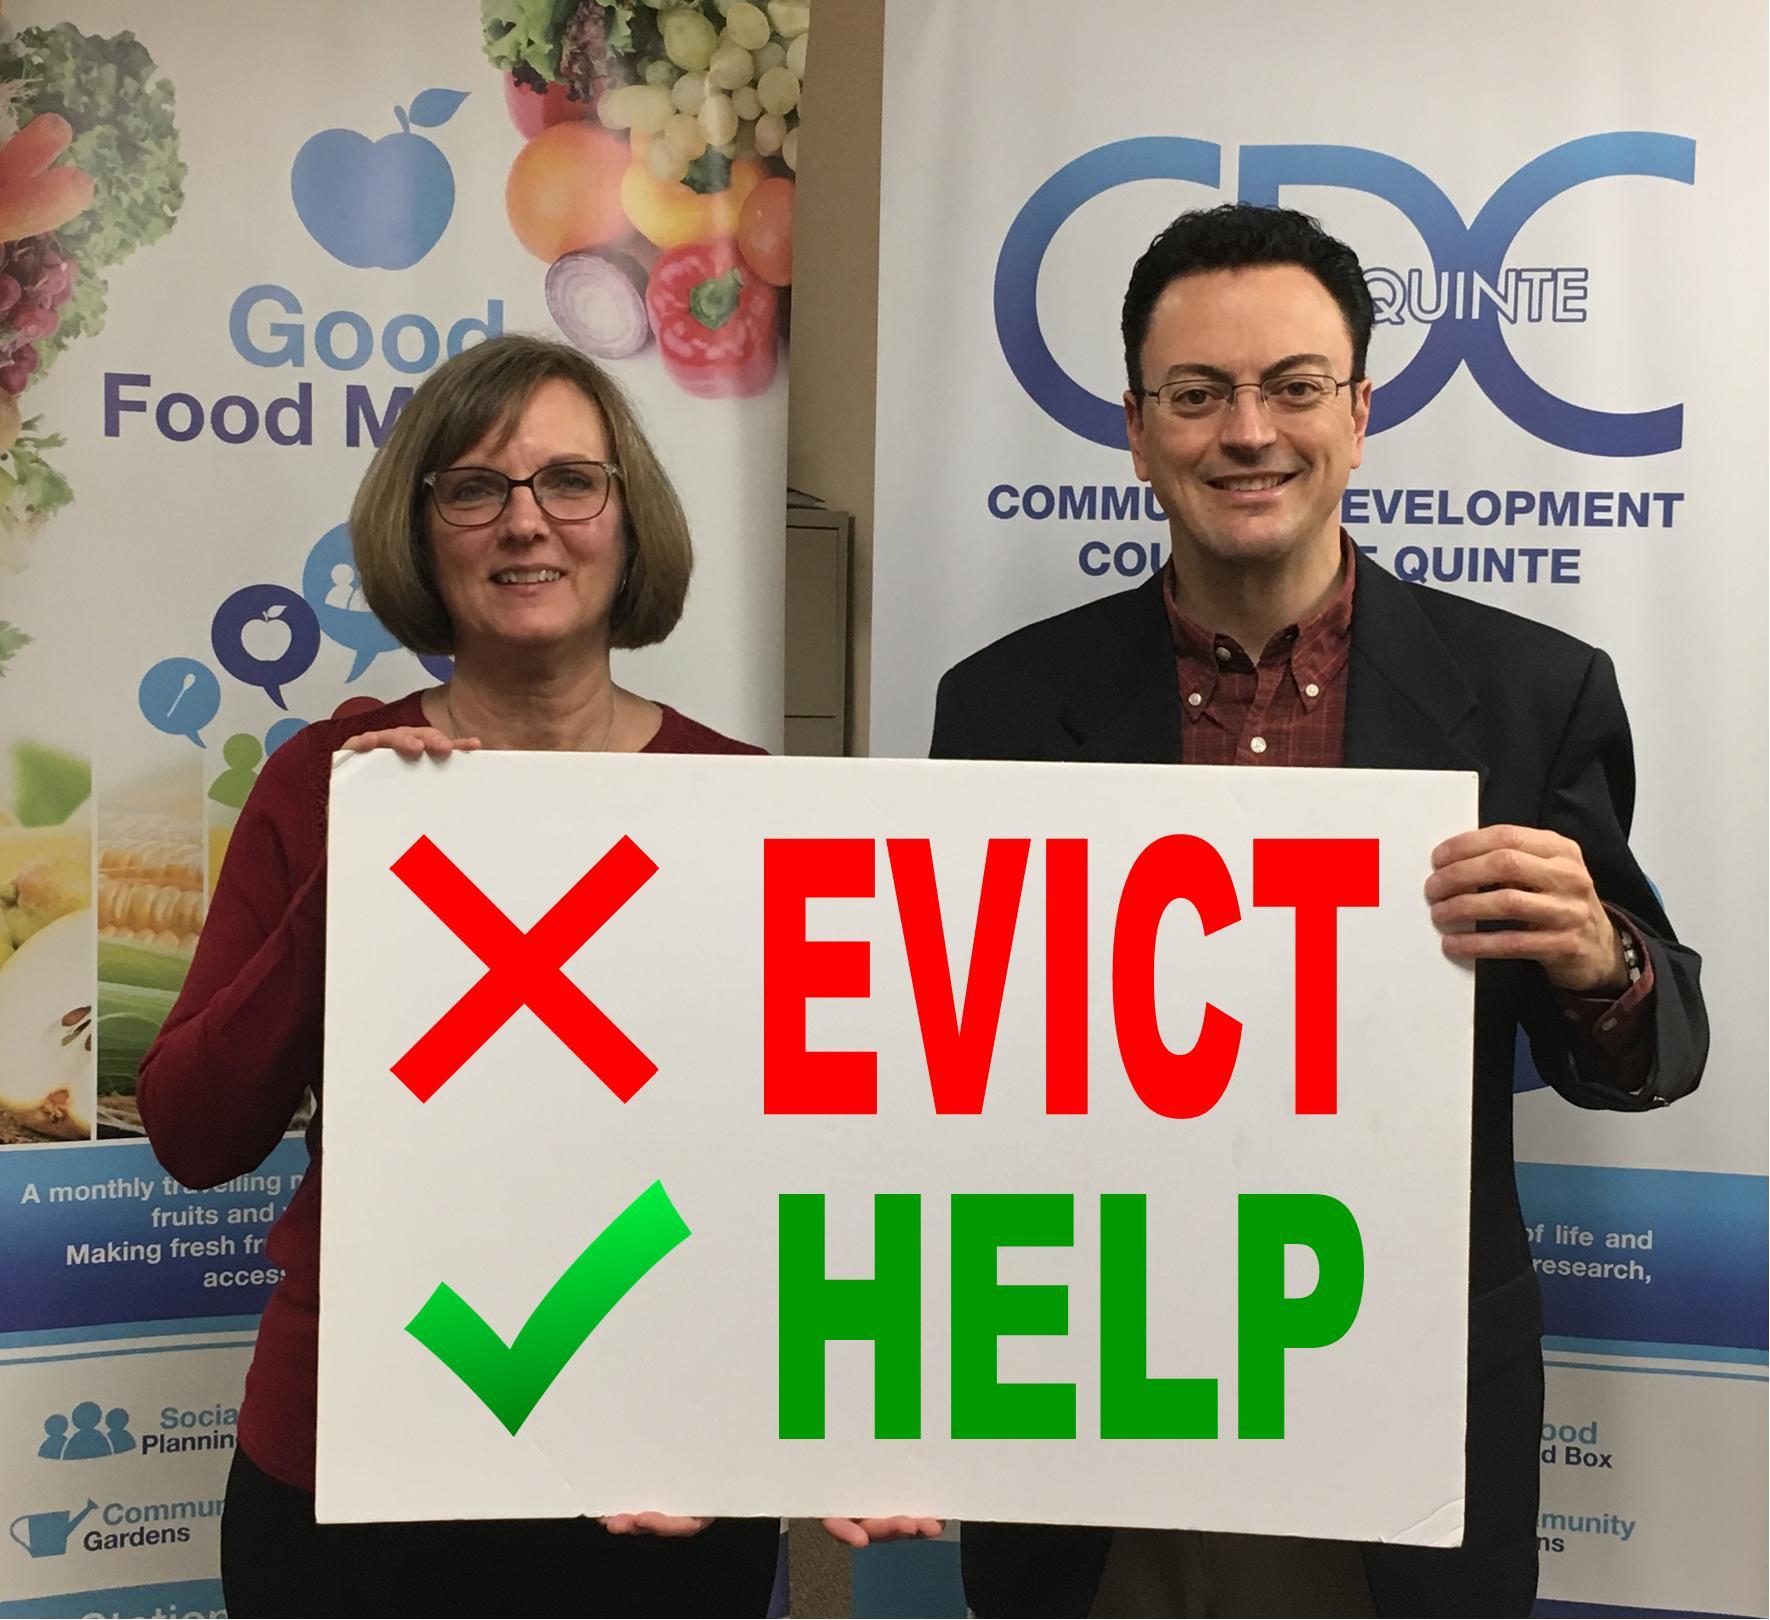 Meeting on avoiding evictions deemed a success